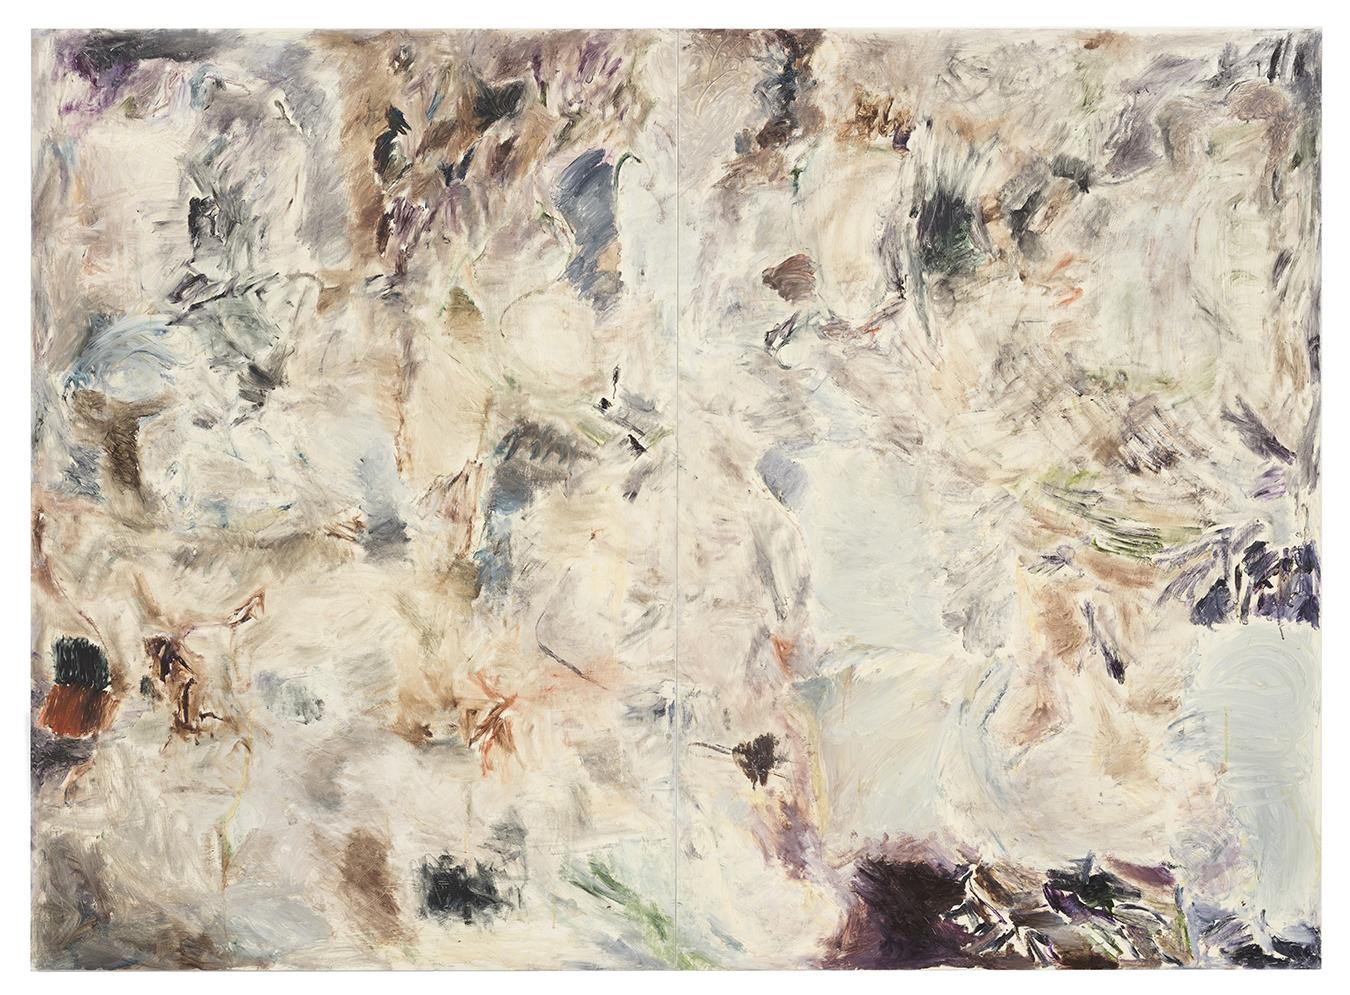 Joaquín Boz. <em>Nuevas Sustancias</em>, 2018. Oil on panel, 74 3/4 x 102 3/8 inches (190 x 260 cm)